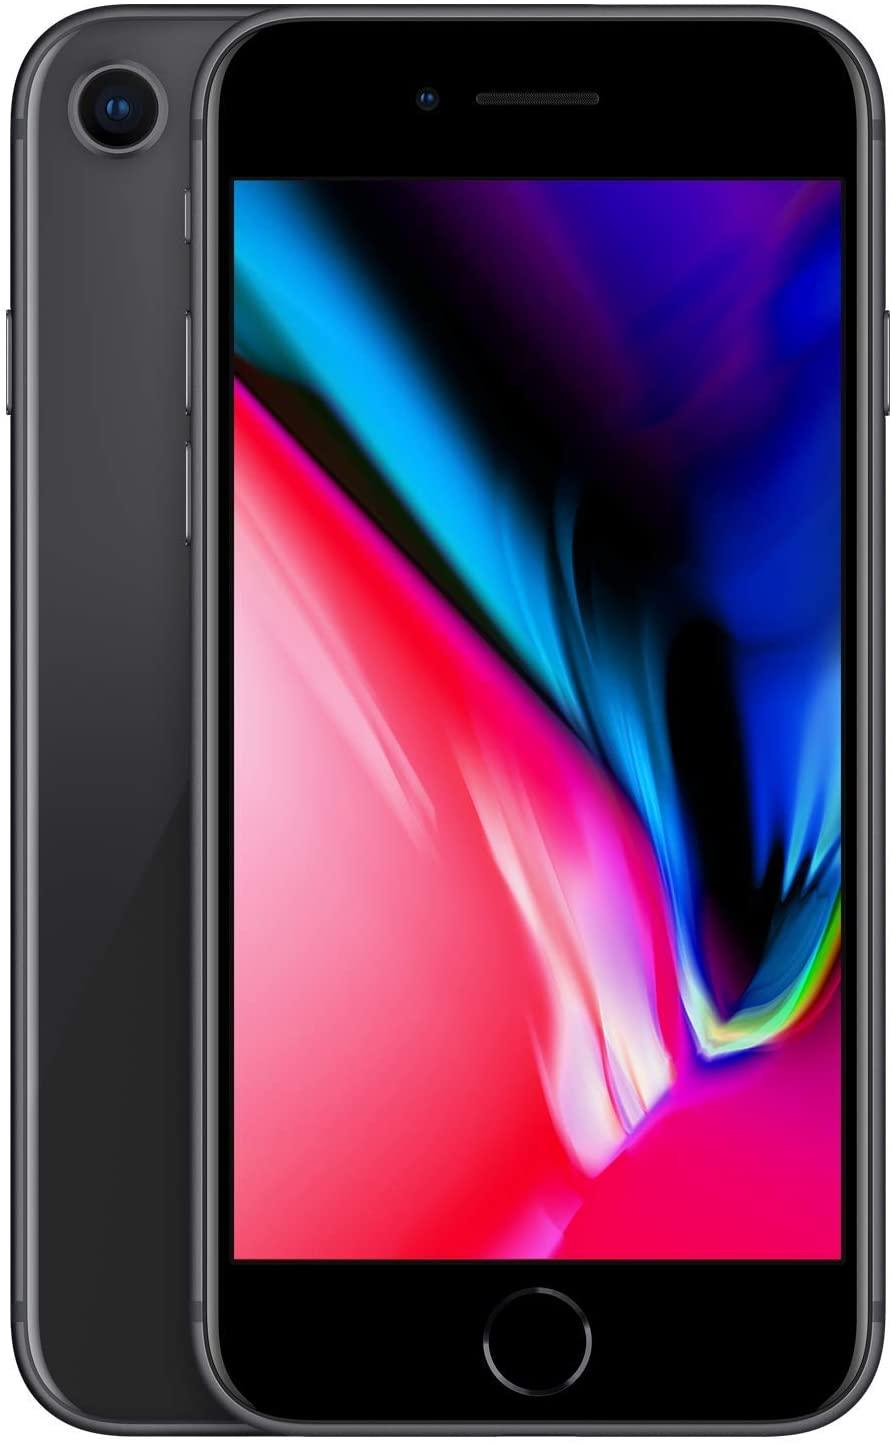 Apple Iphone 8 - 64 Go - Smartphone reconditionné grade B - Gris sidéral